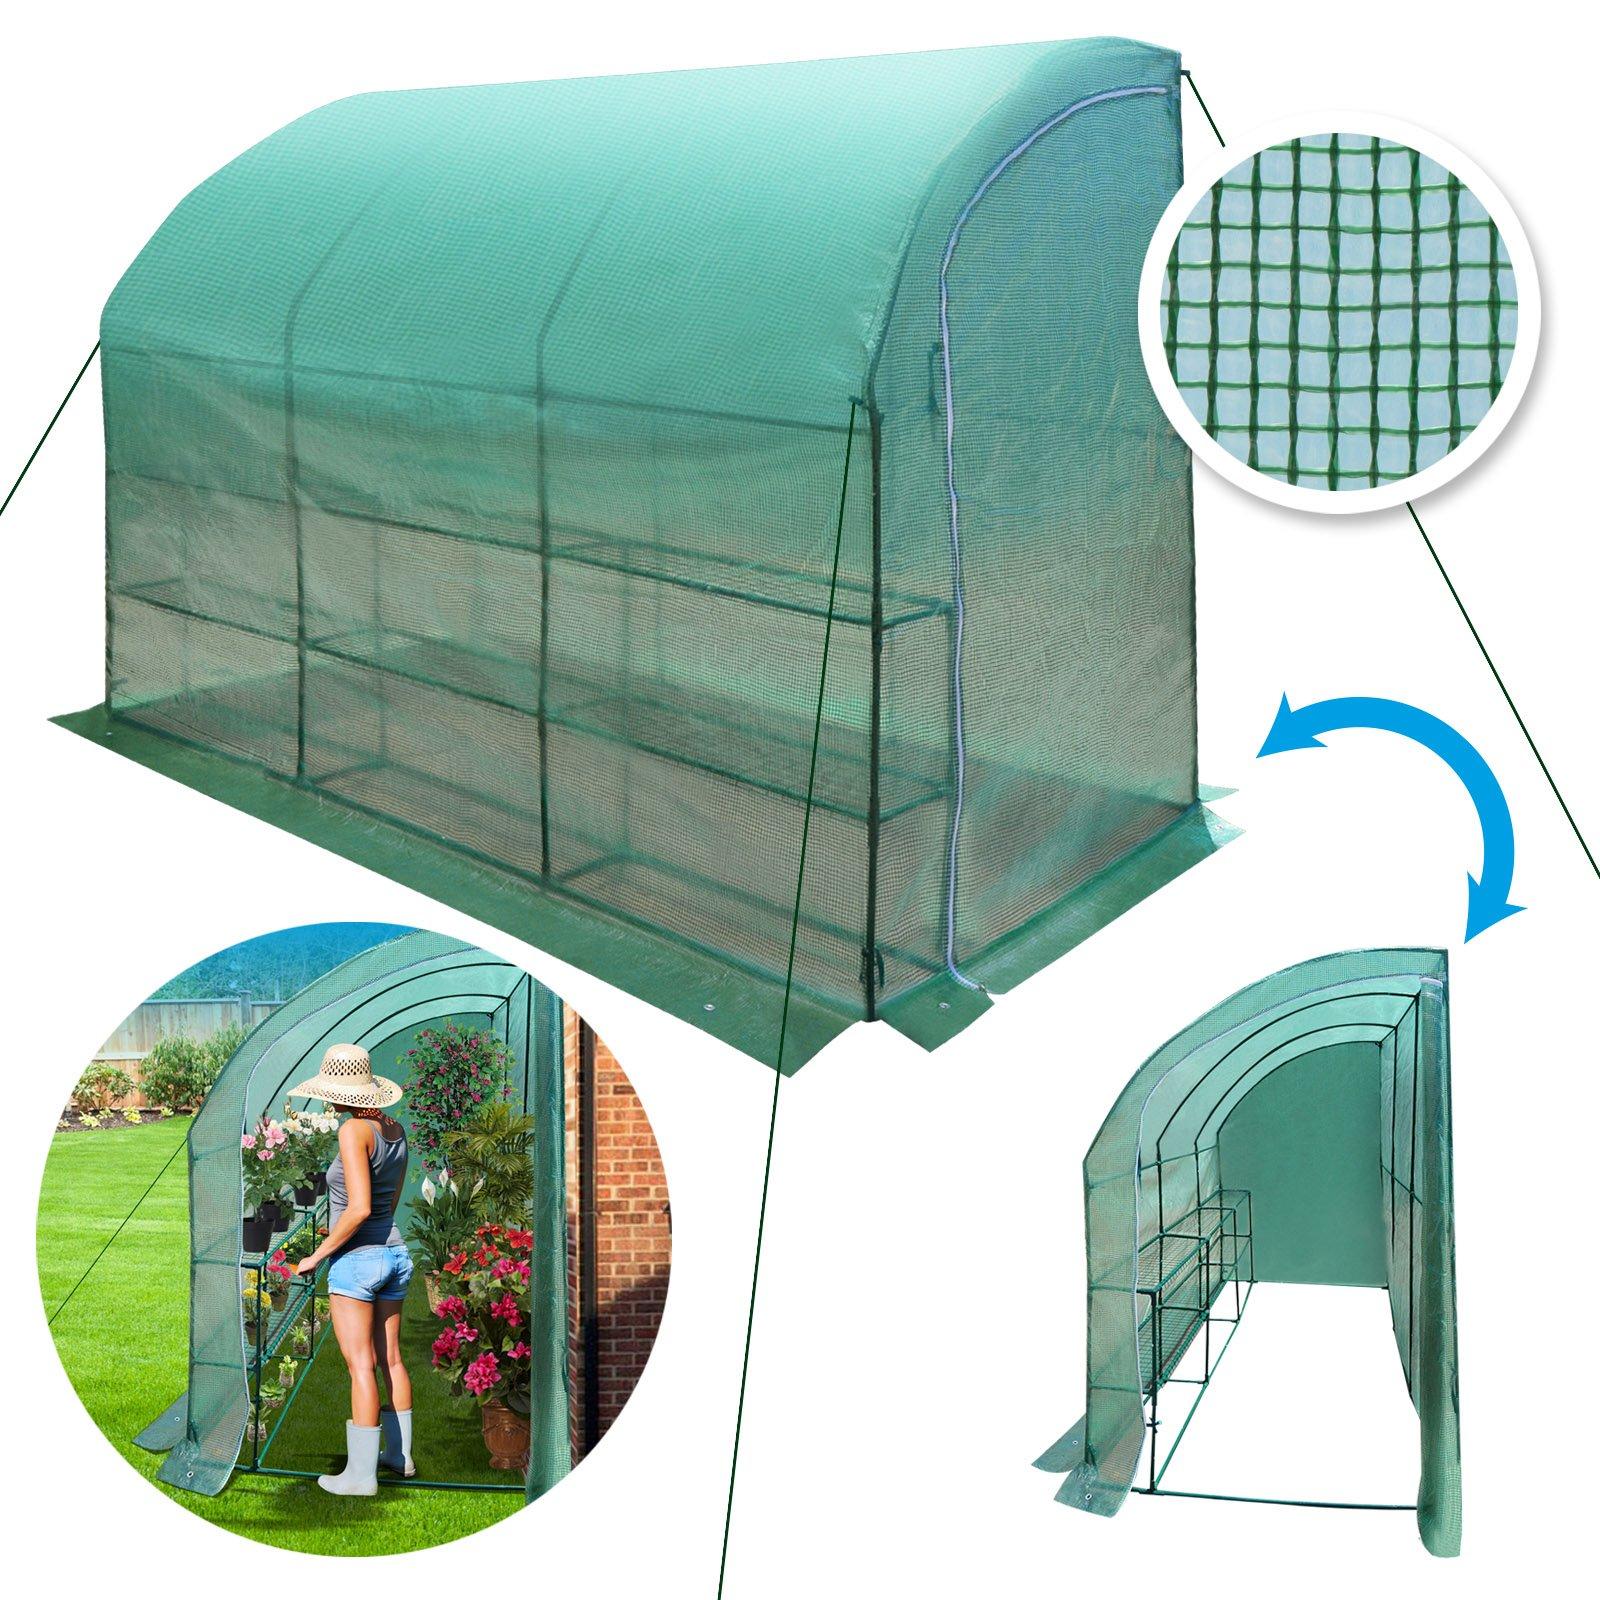 BenefitUSA ZH0124 Green New Large Walk-in Gardening Sunshade Greenhouse Outdoor, 10 x 5 x 7',